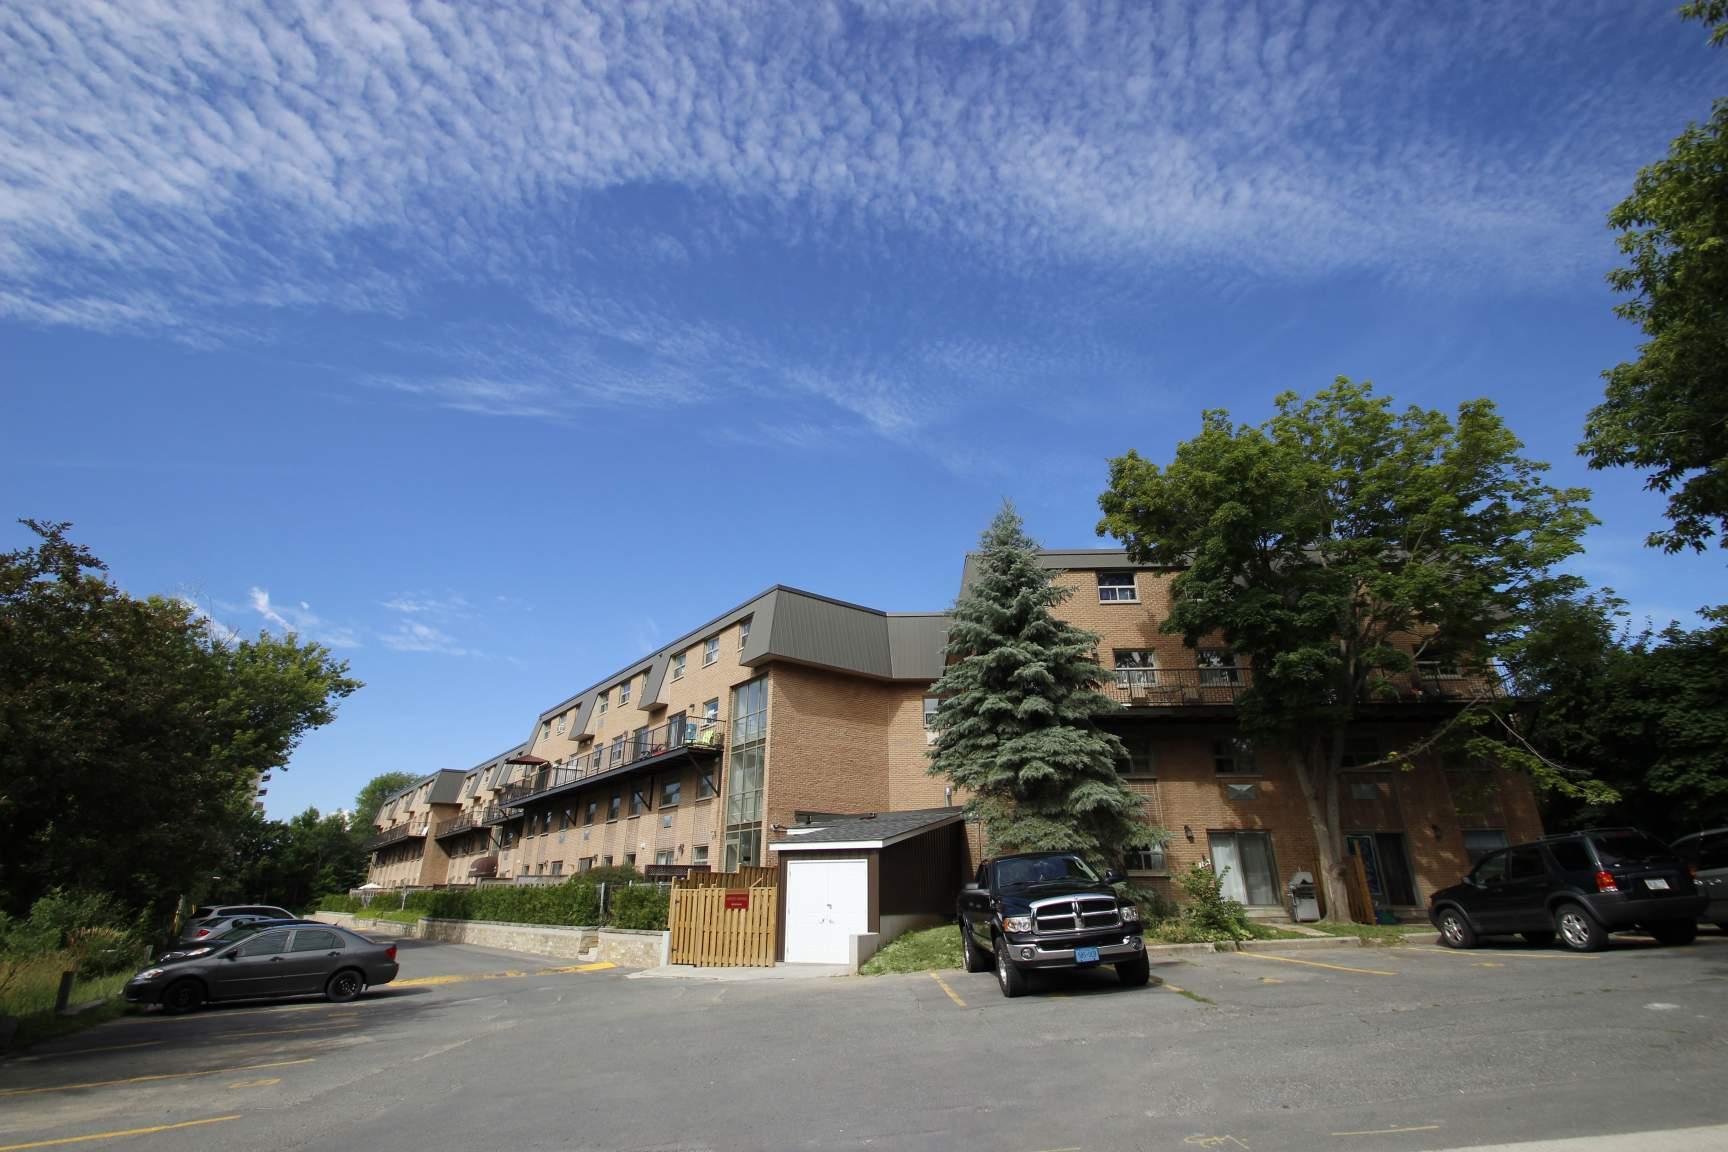 Laurentian Apartments photo #1